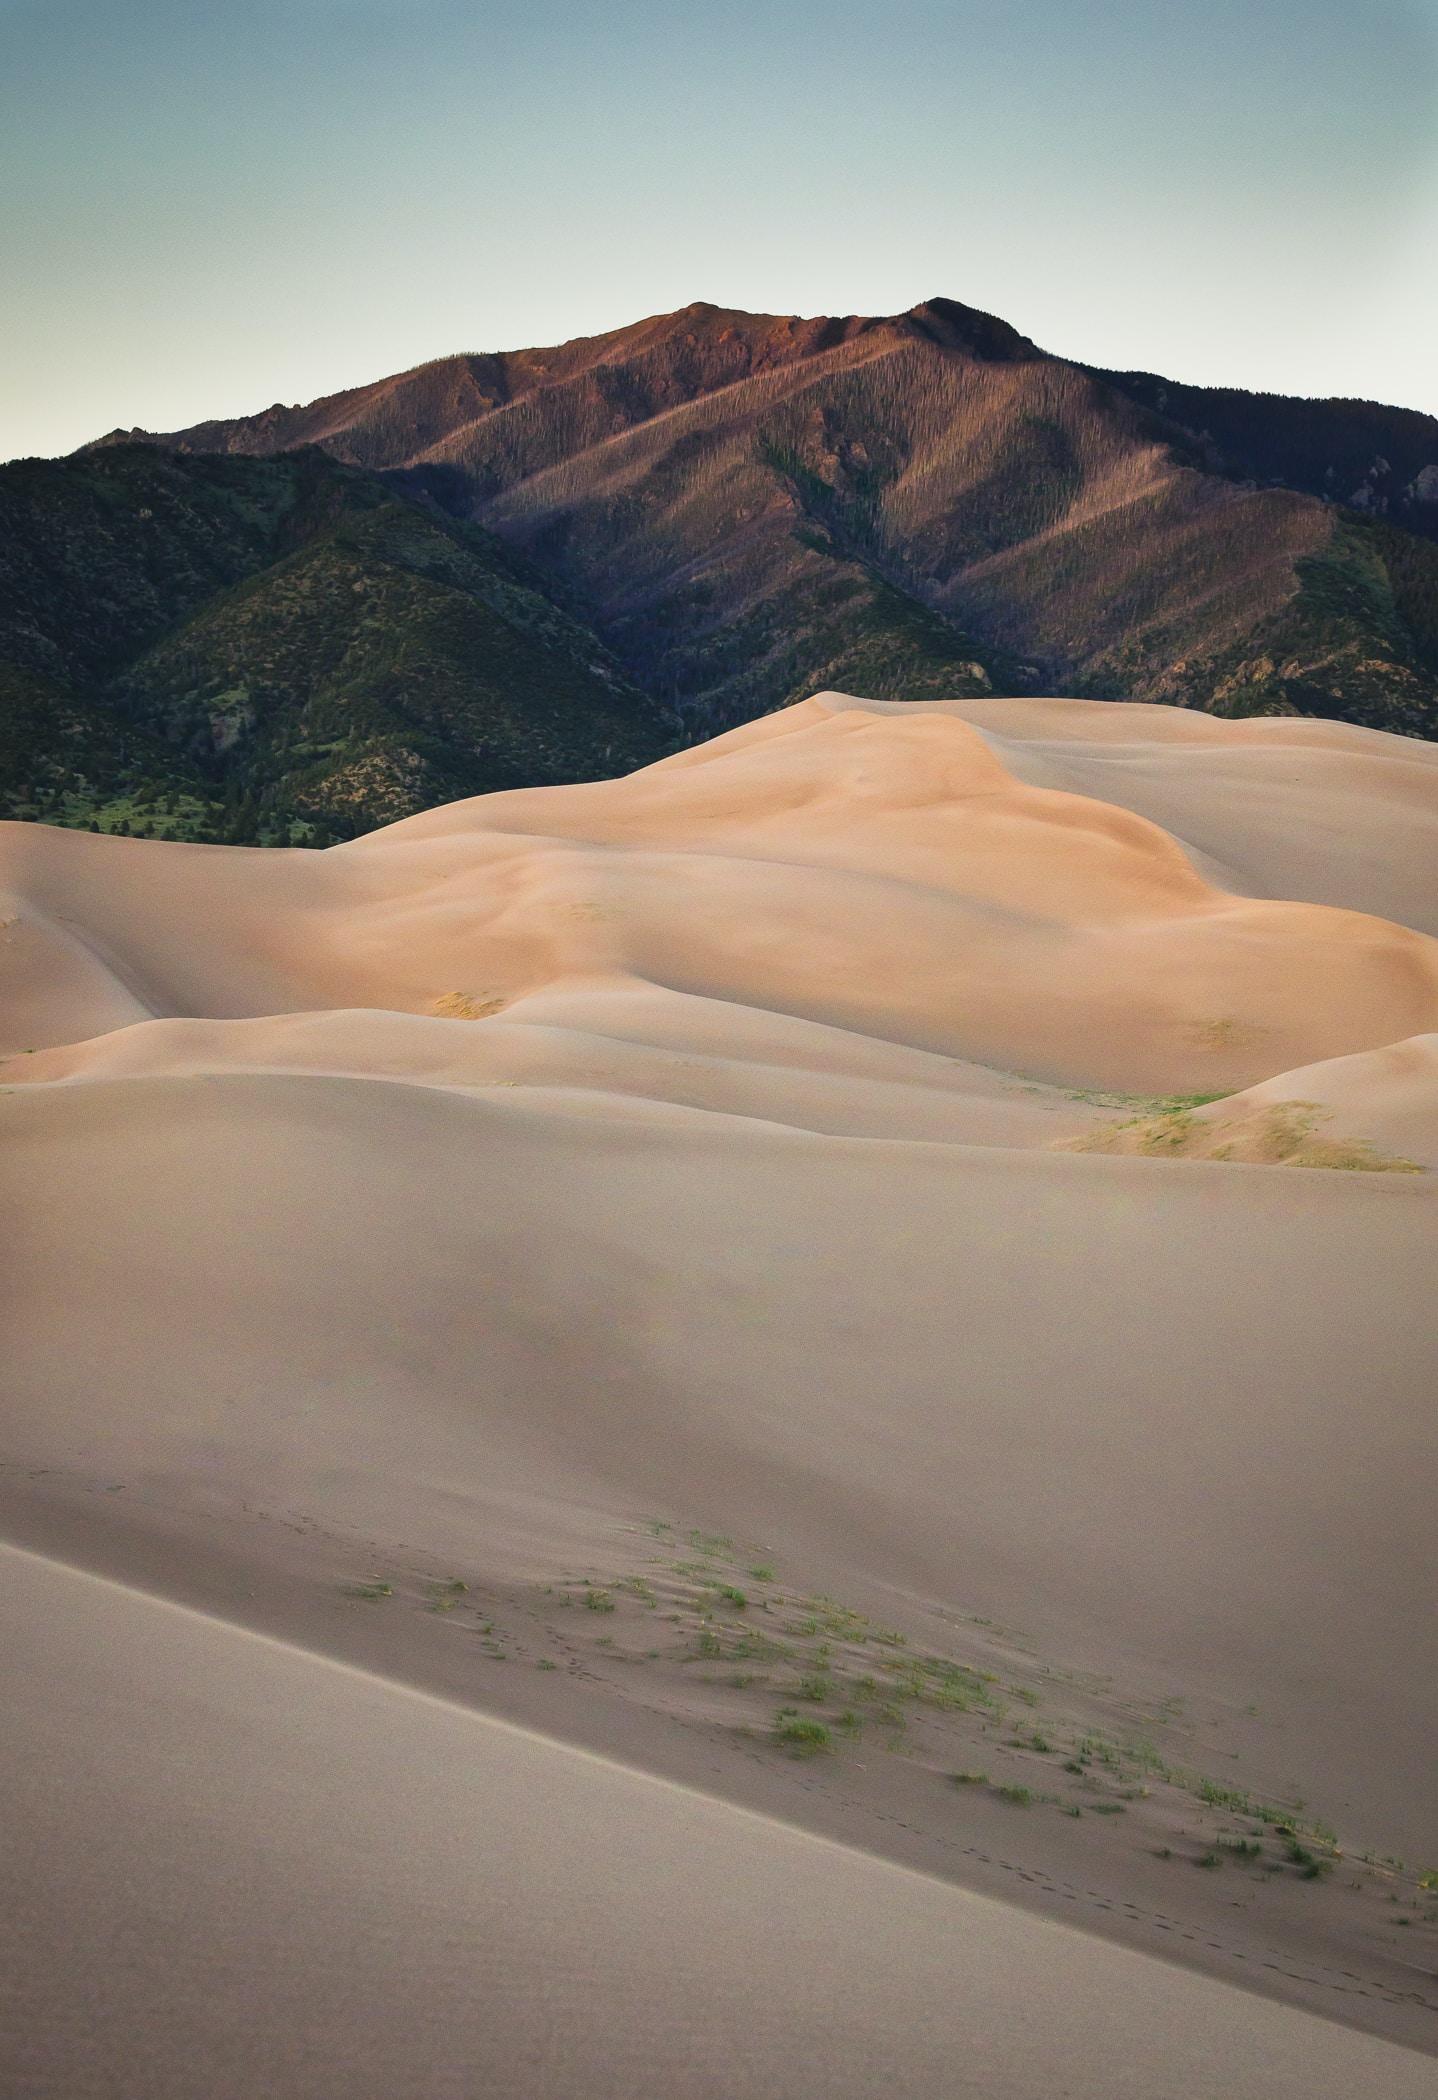 sand dunes near brown mountain